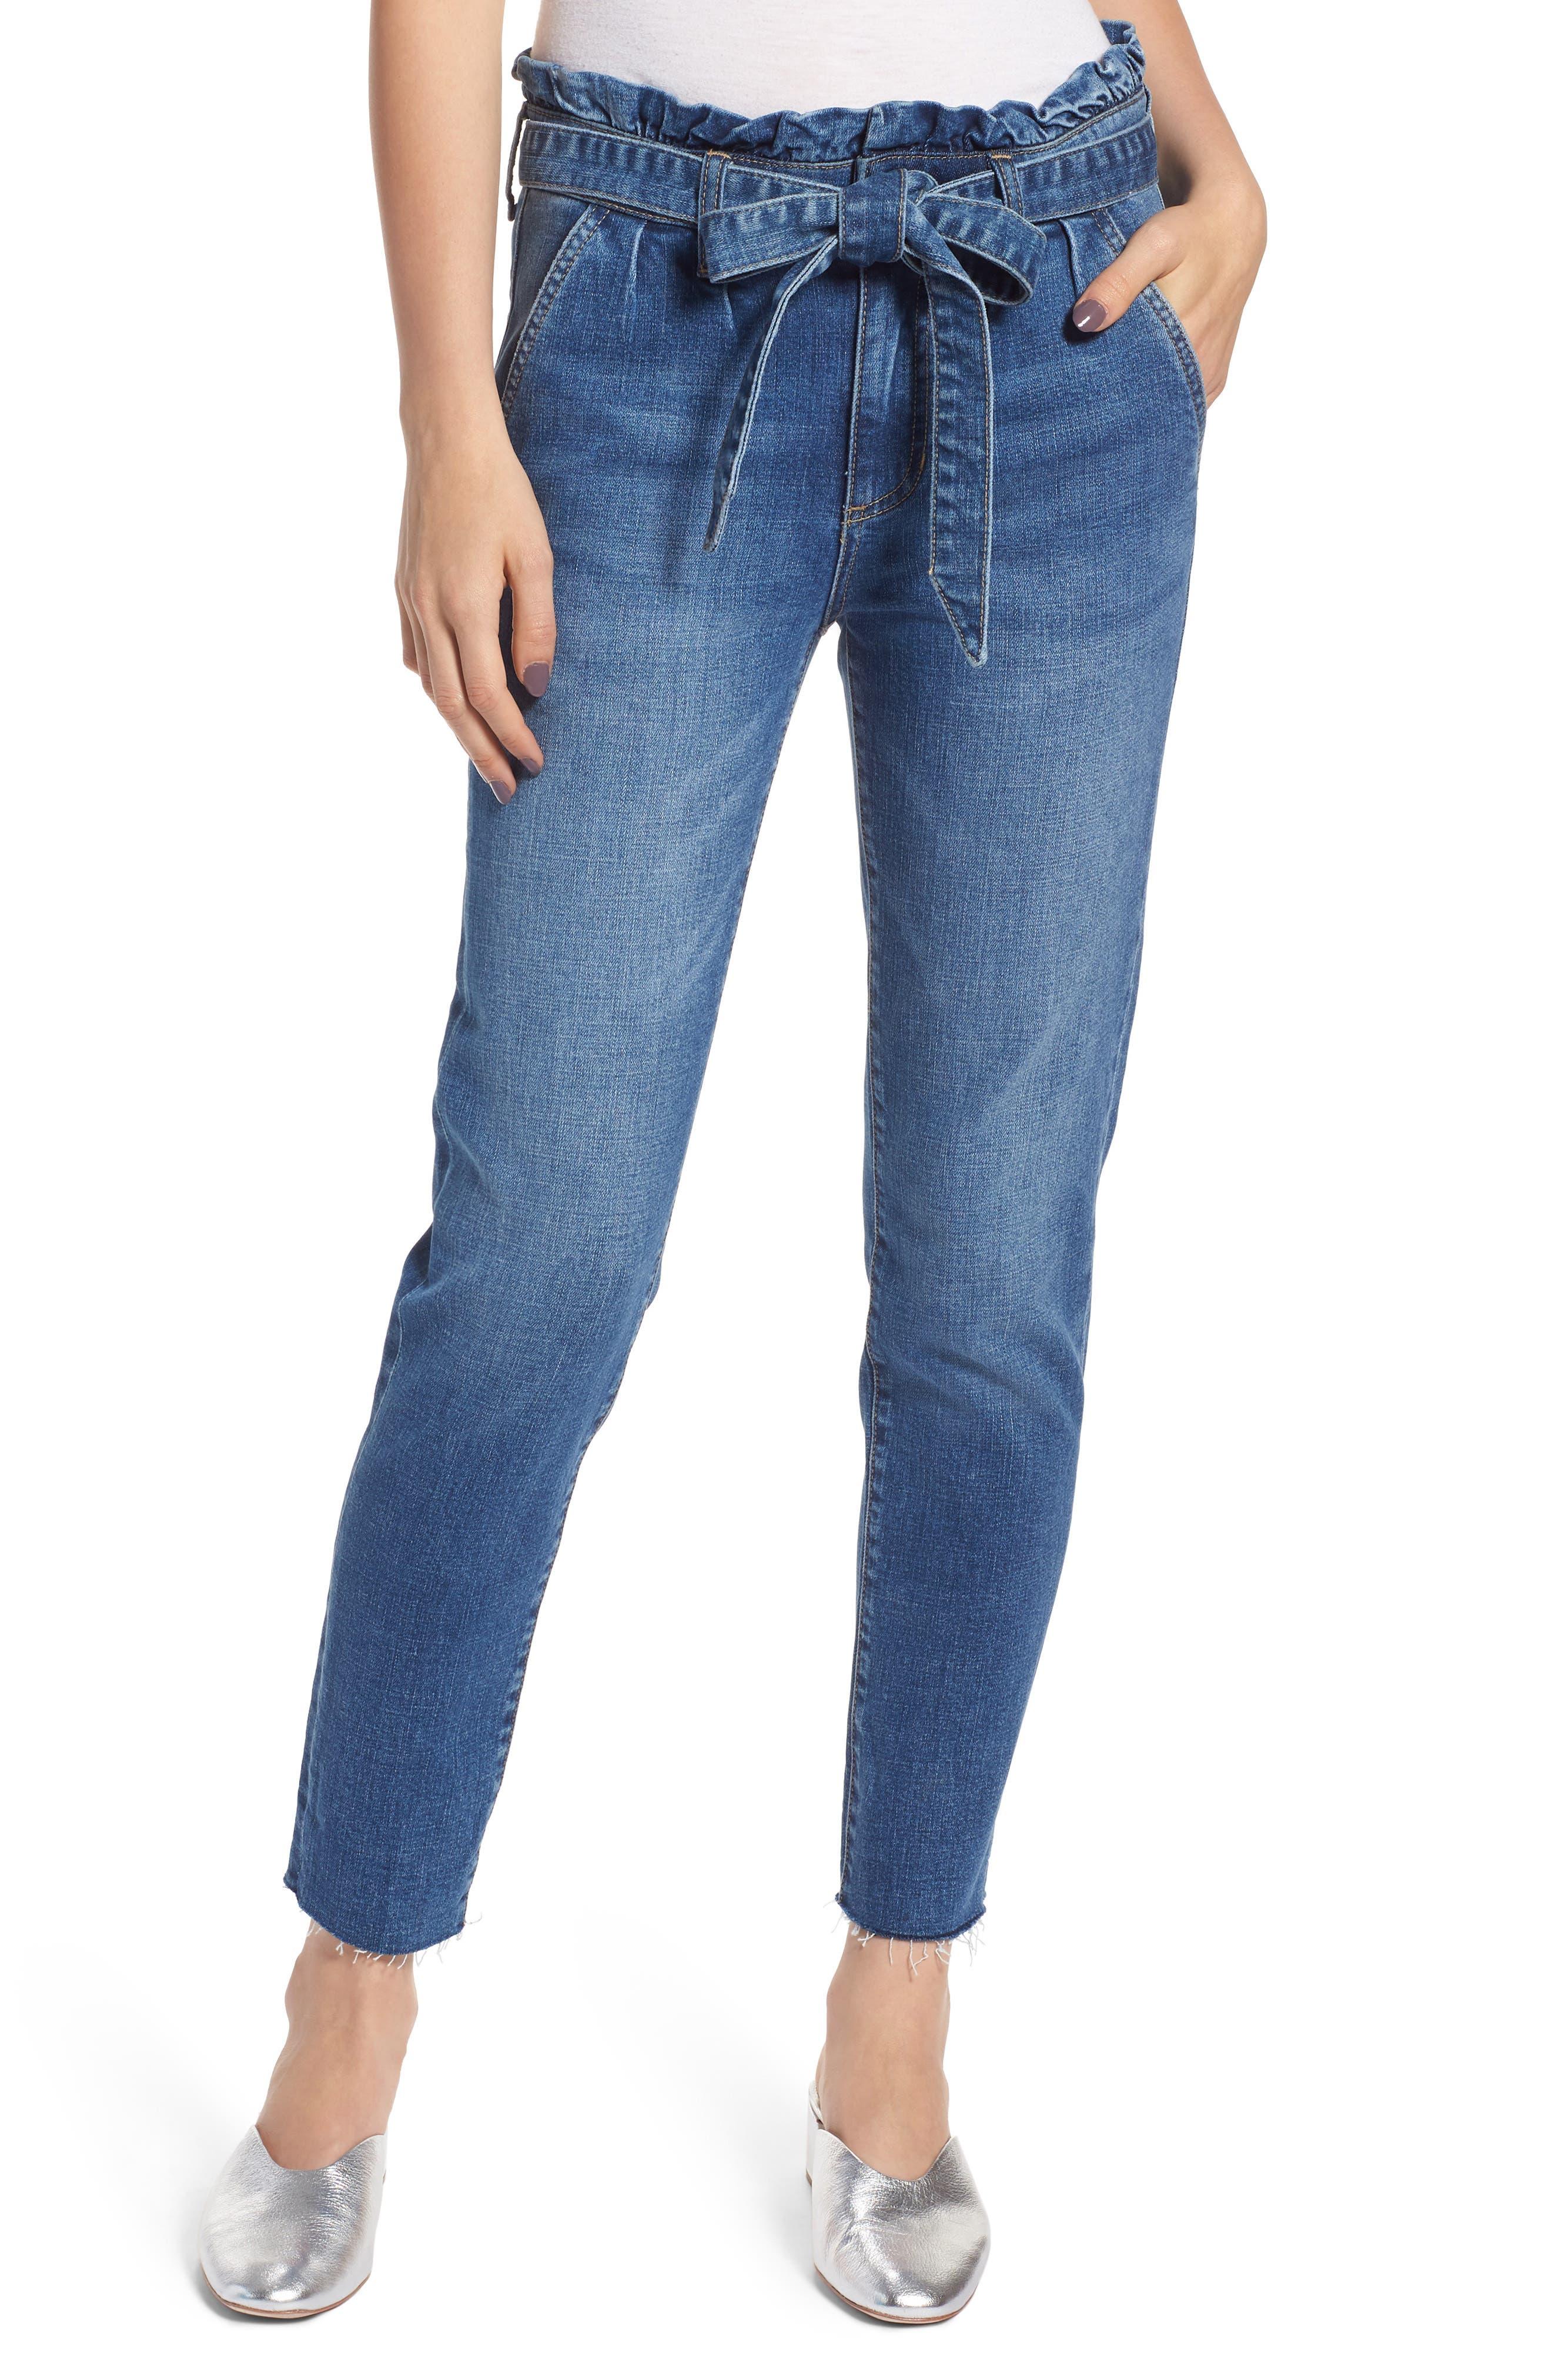 PROSPERITY DENIM Paperbag Waist Skinny Jeans, Main, color, PRETTY